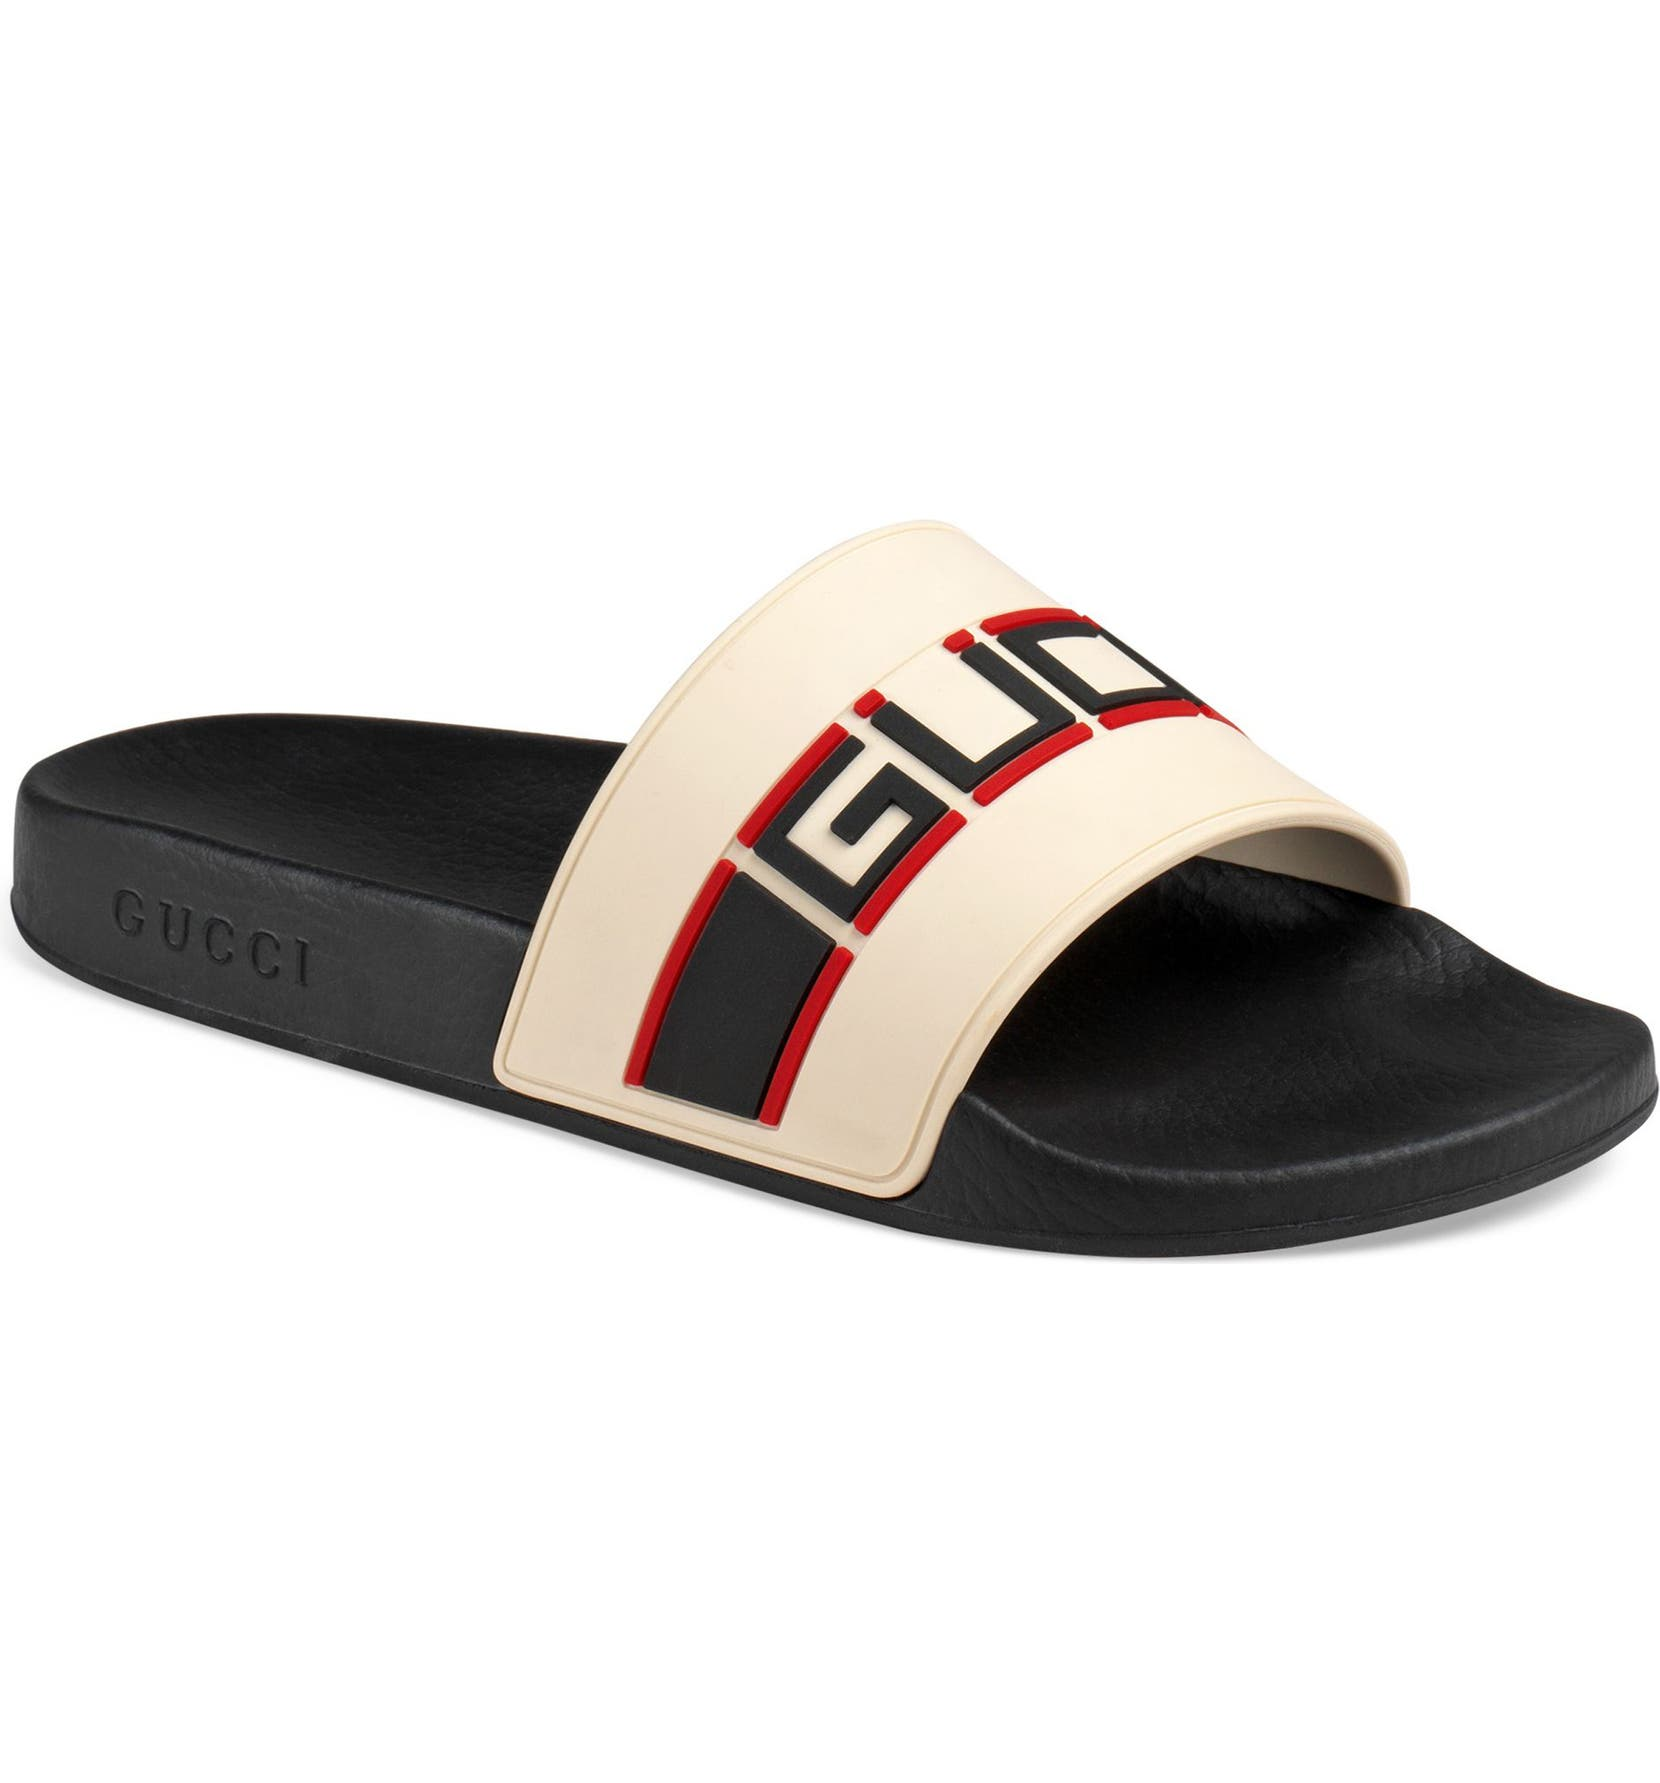 7e5a8fffccdea Gucci Pursuit Stripe Slide Sandal (Men)